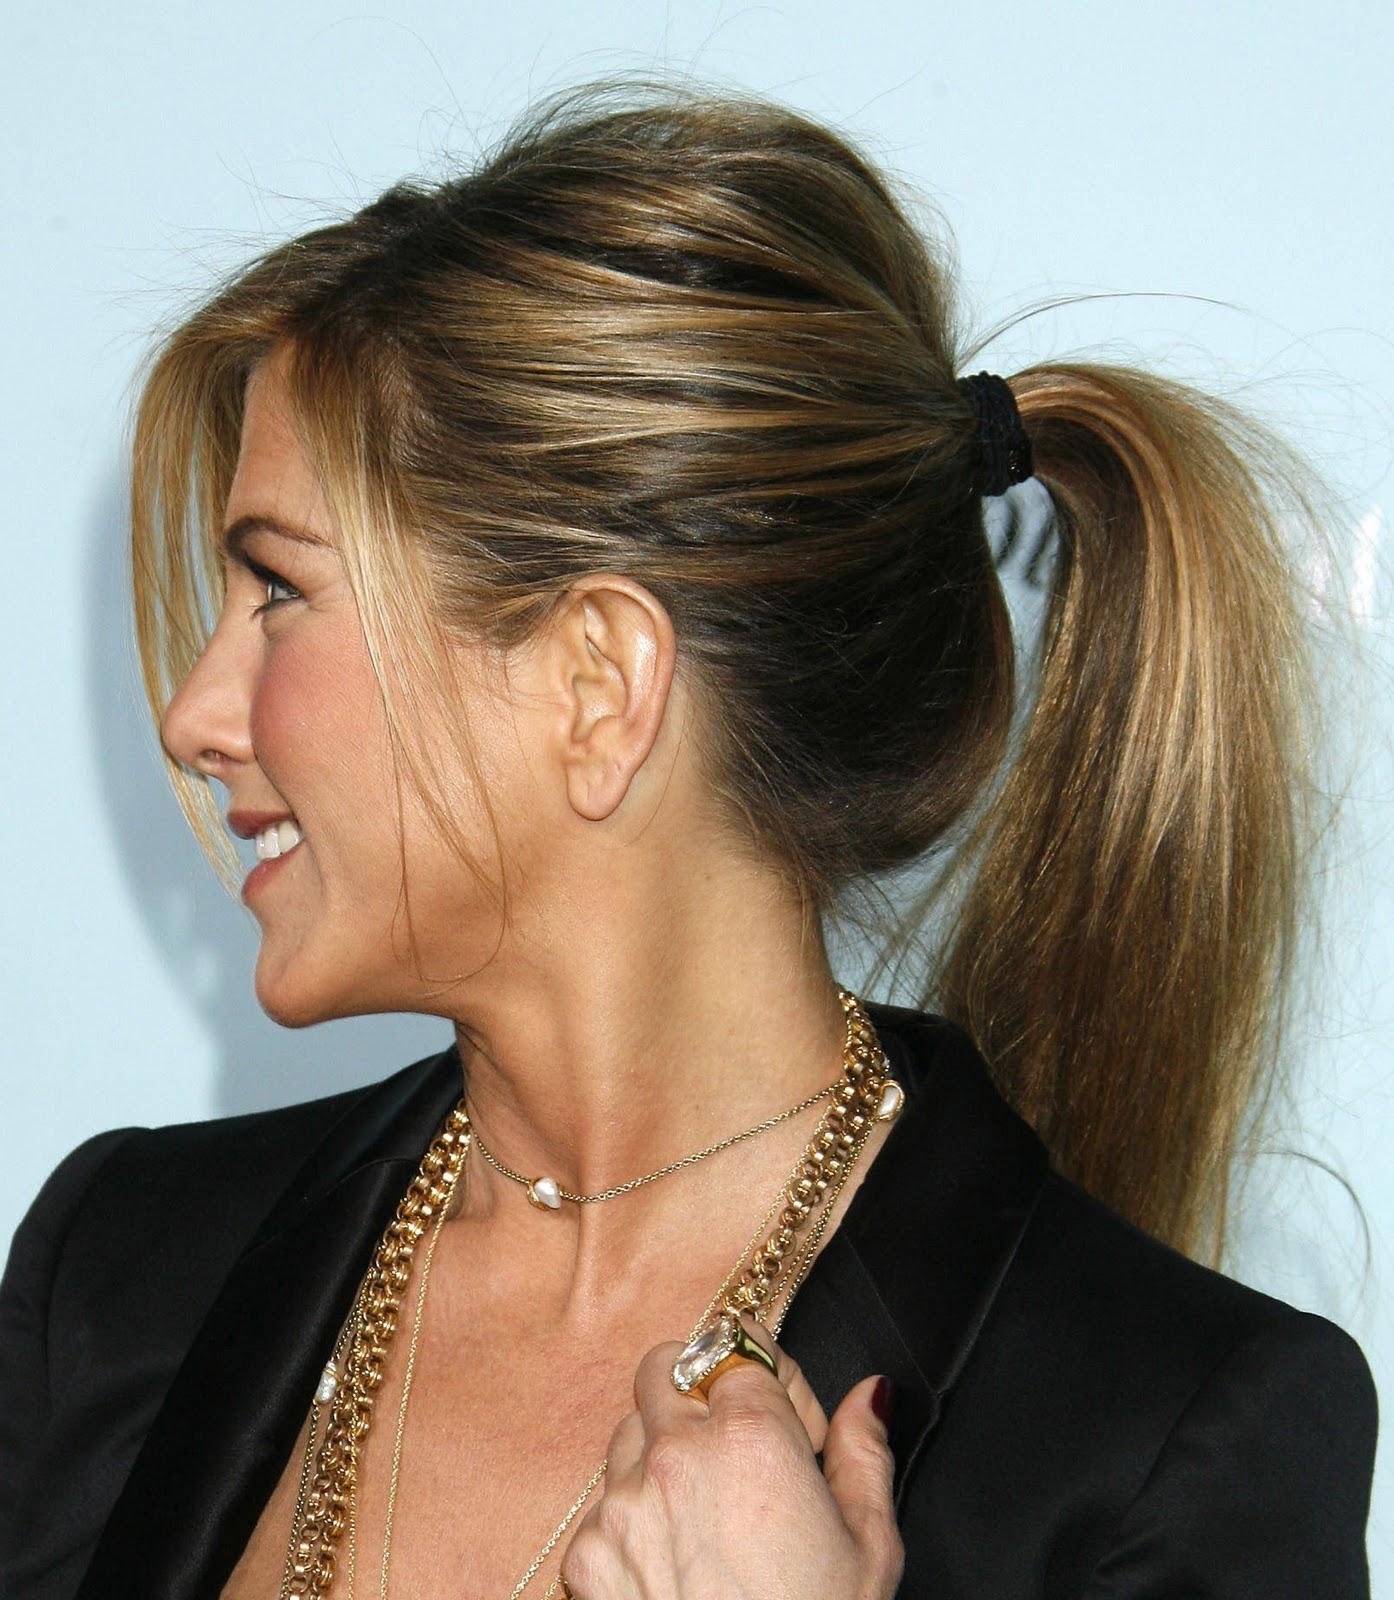 http://4.bp.blogspot.com/-qkJrMTz50nk/TyBfBPCLvAI/AAAAAAAABL8/GjMbIEwW7vo/s1600/Rabinho+com+bump+it+_Jenniferaniston.jpg